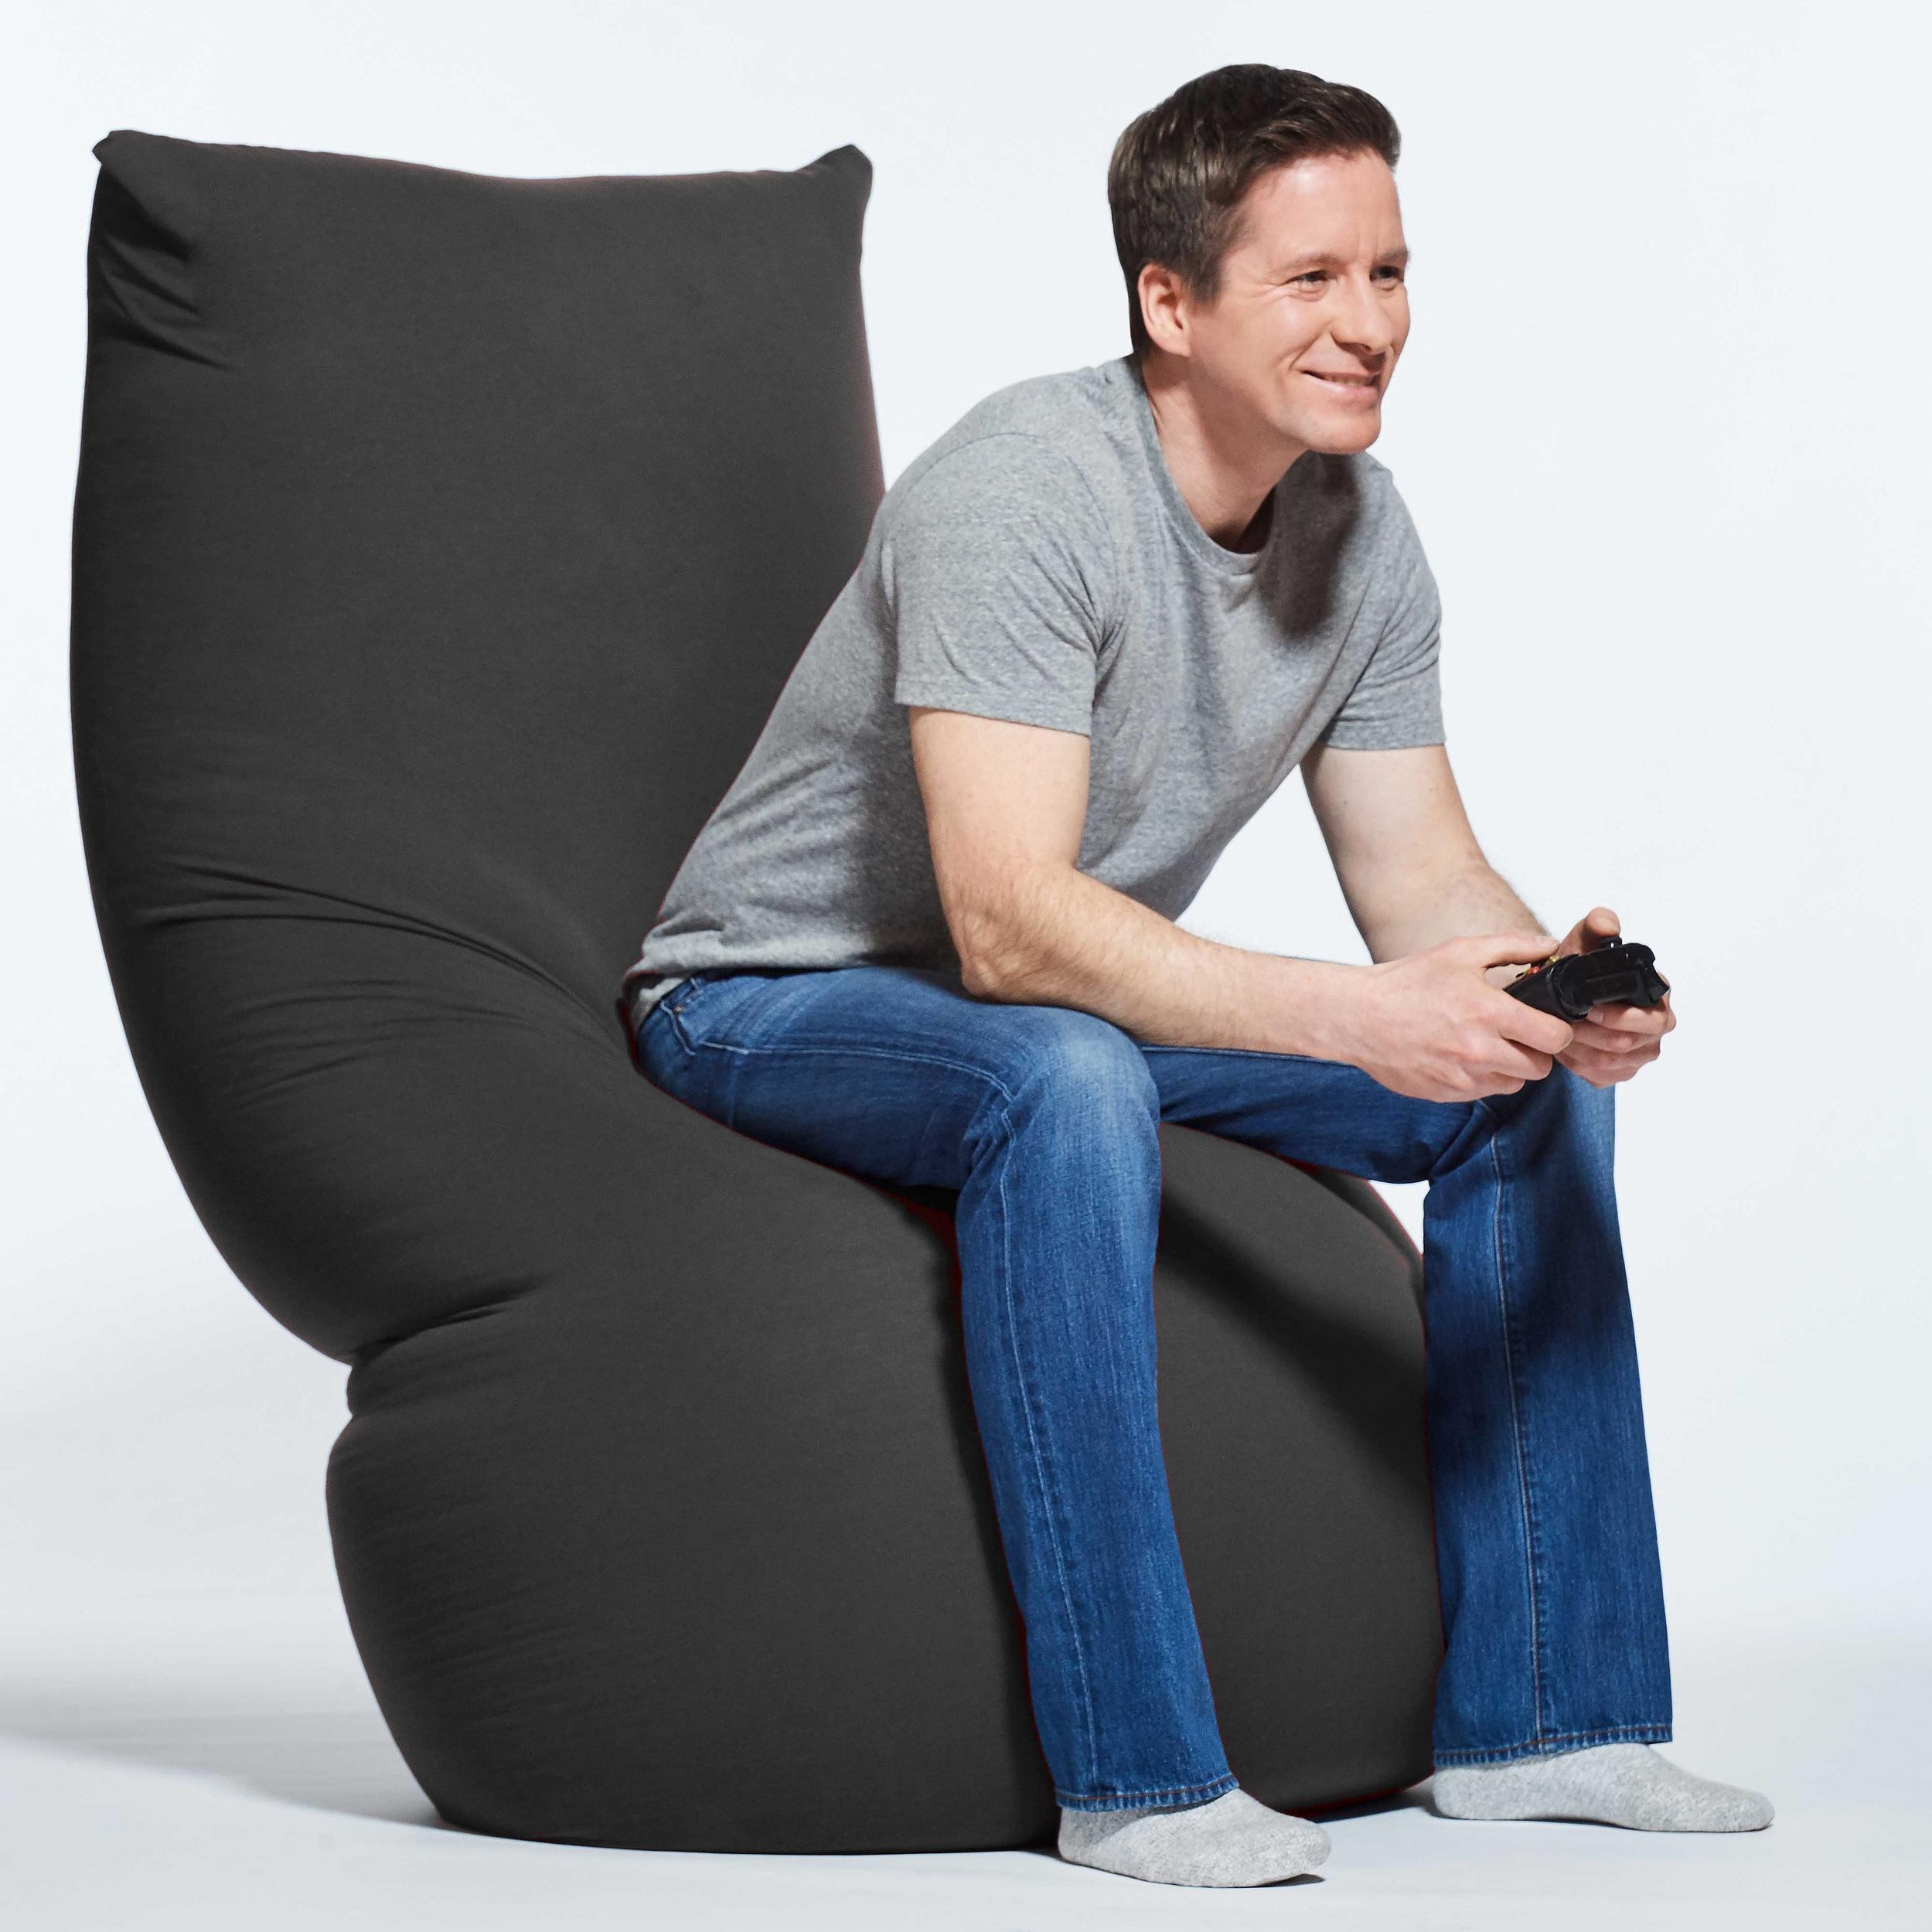 Max+Gaming+Grey.jpg